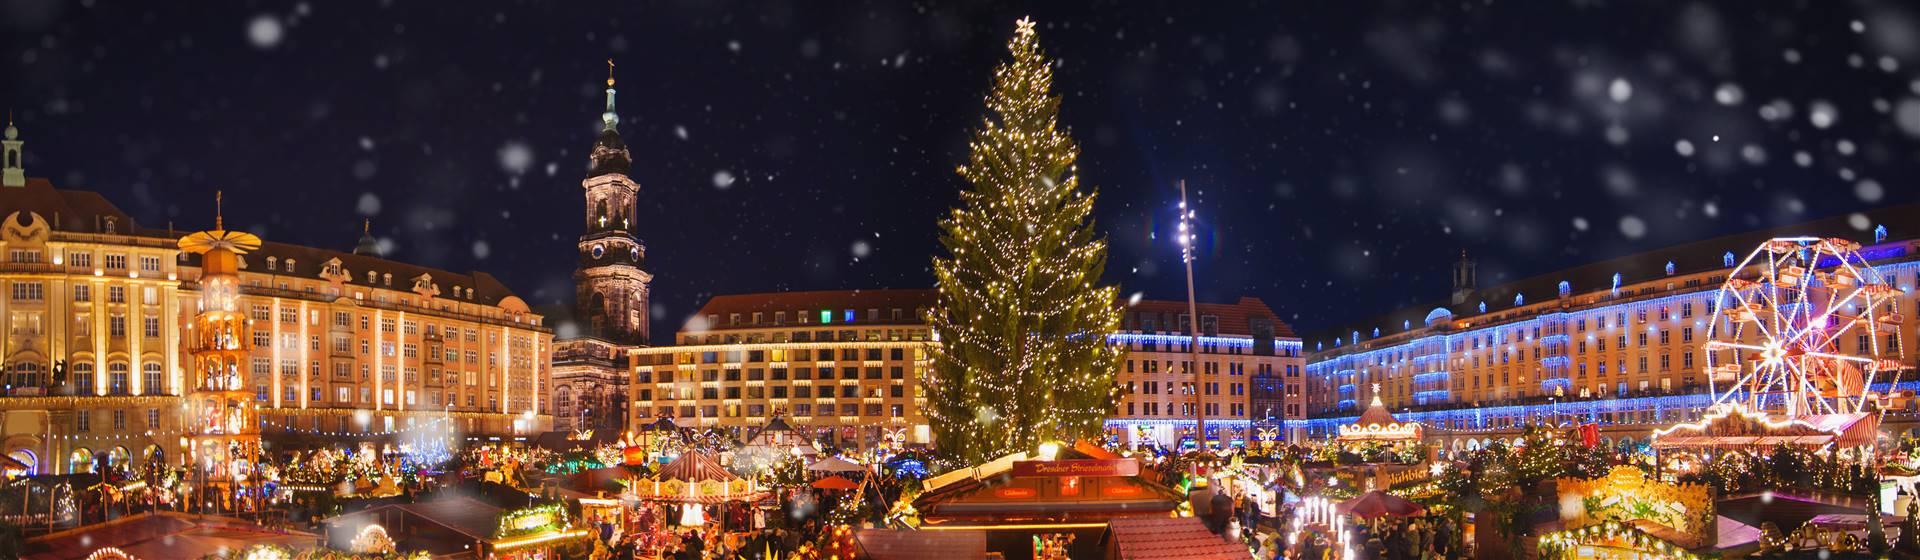 "<img src=""christmasmarkets3-adobestock_299503731.jpeg"" alt=""Christmas Market""/>"